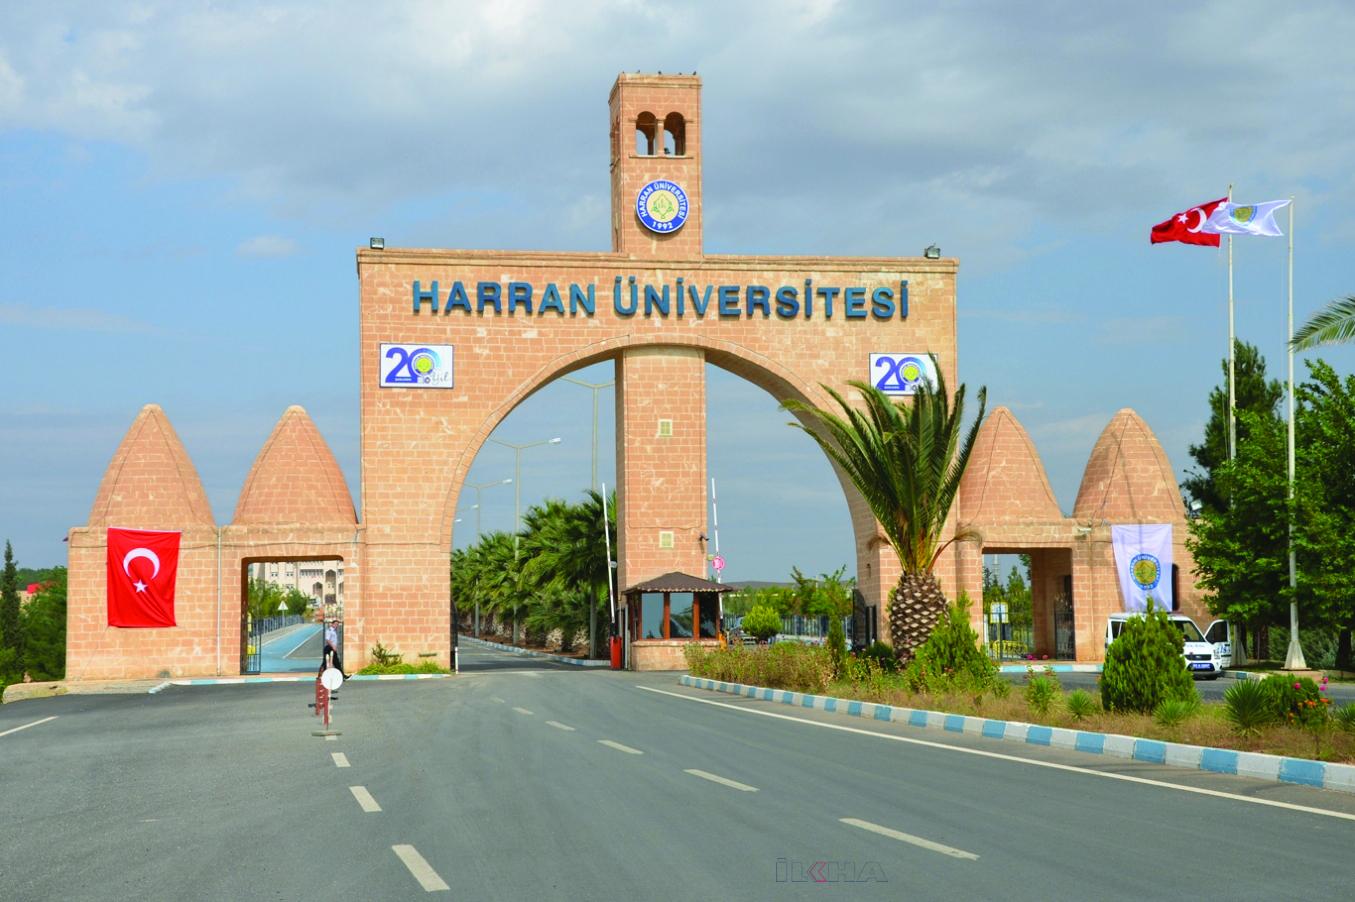 The Turkish Harran University - 2016 (DHA)